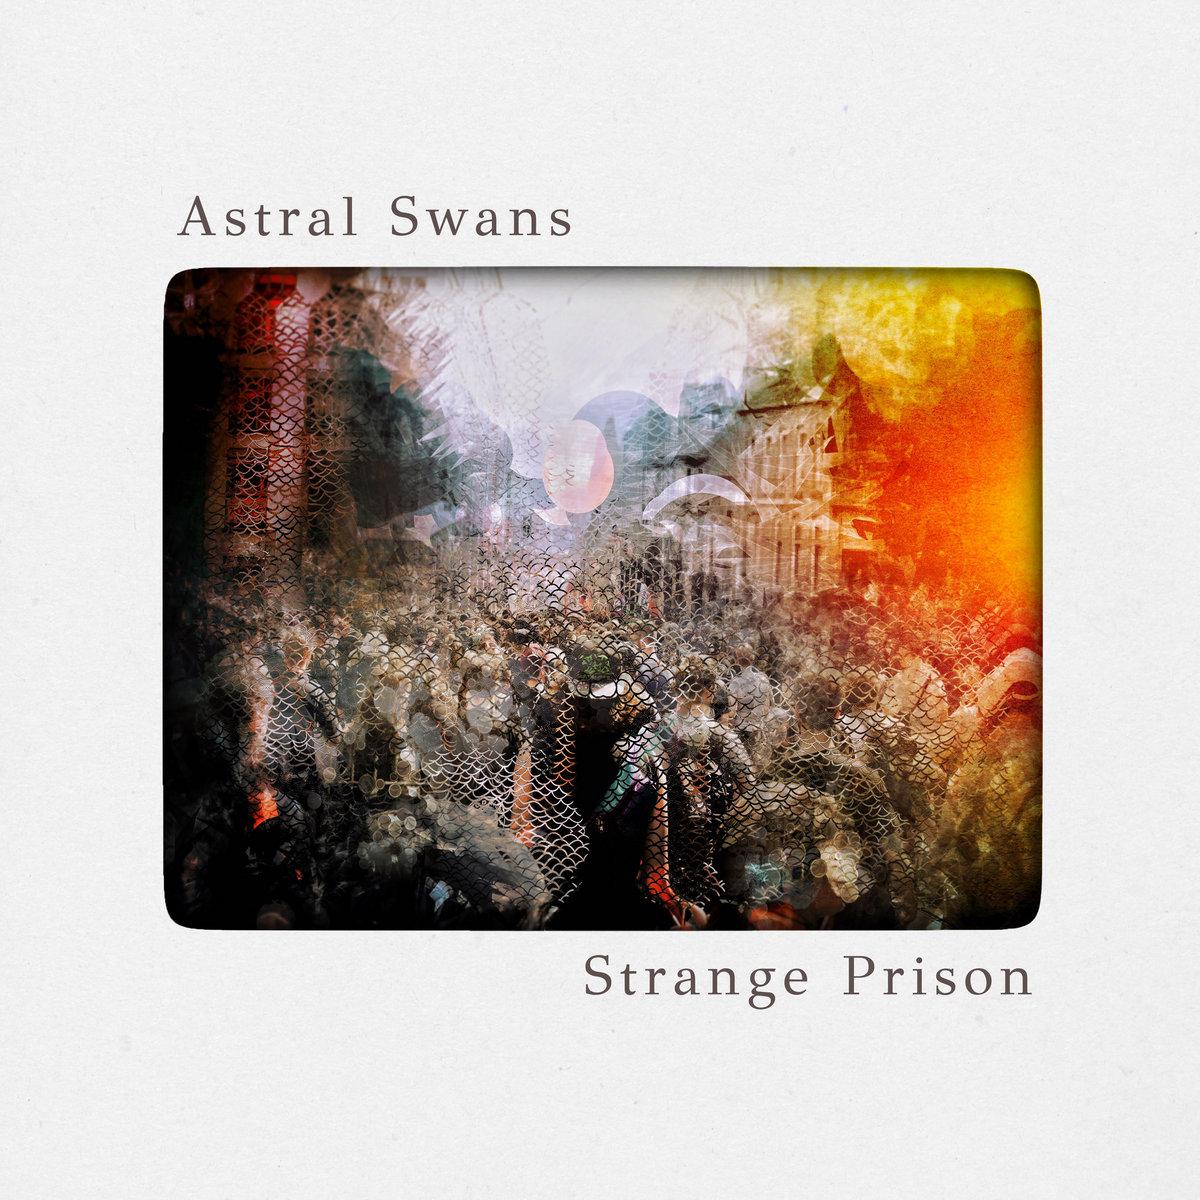 STRANGE PRISON   Astral Swans